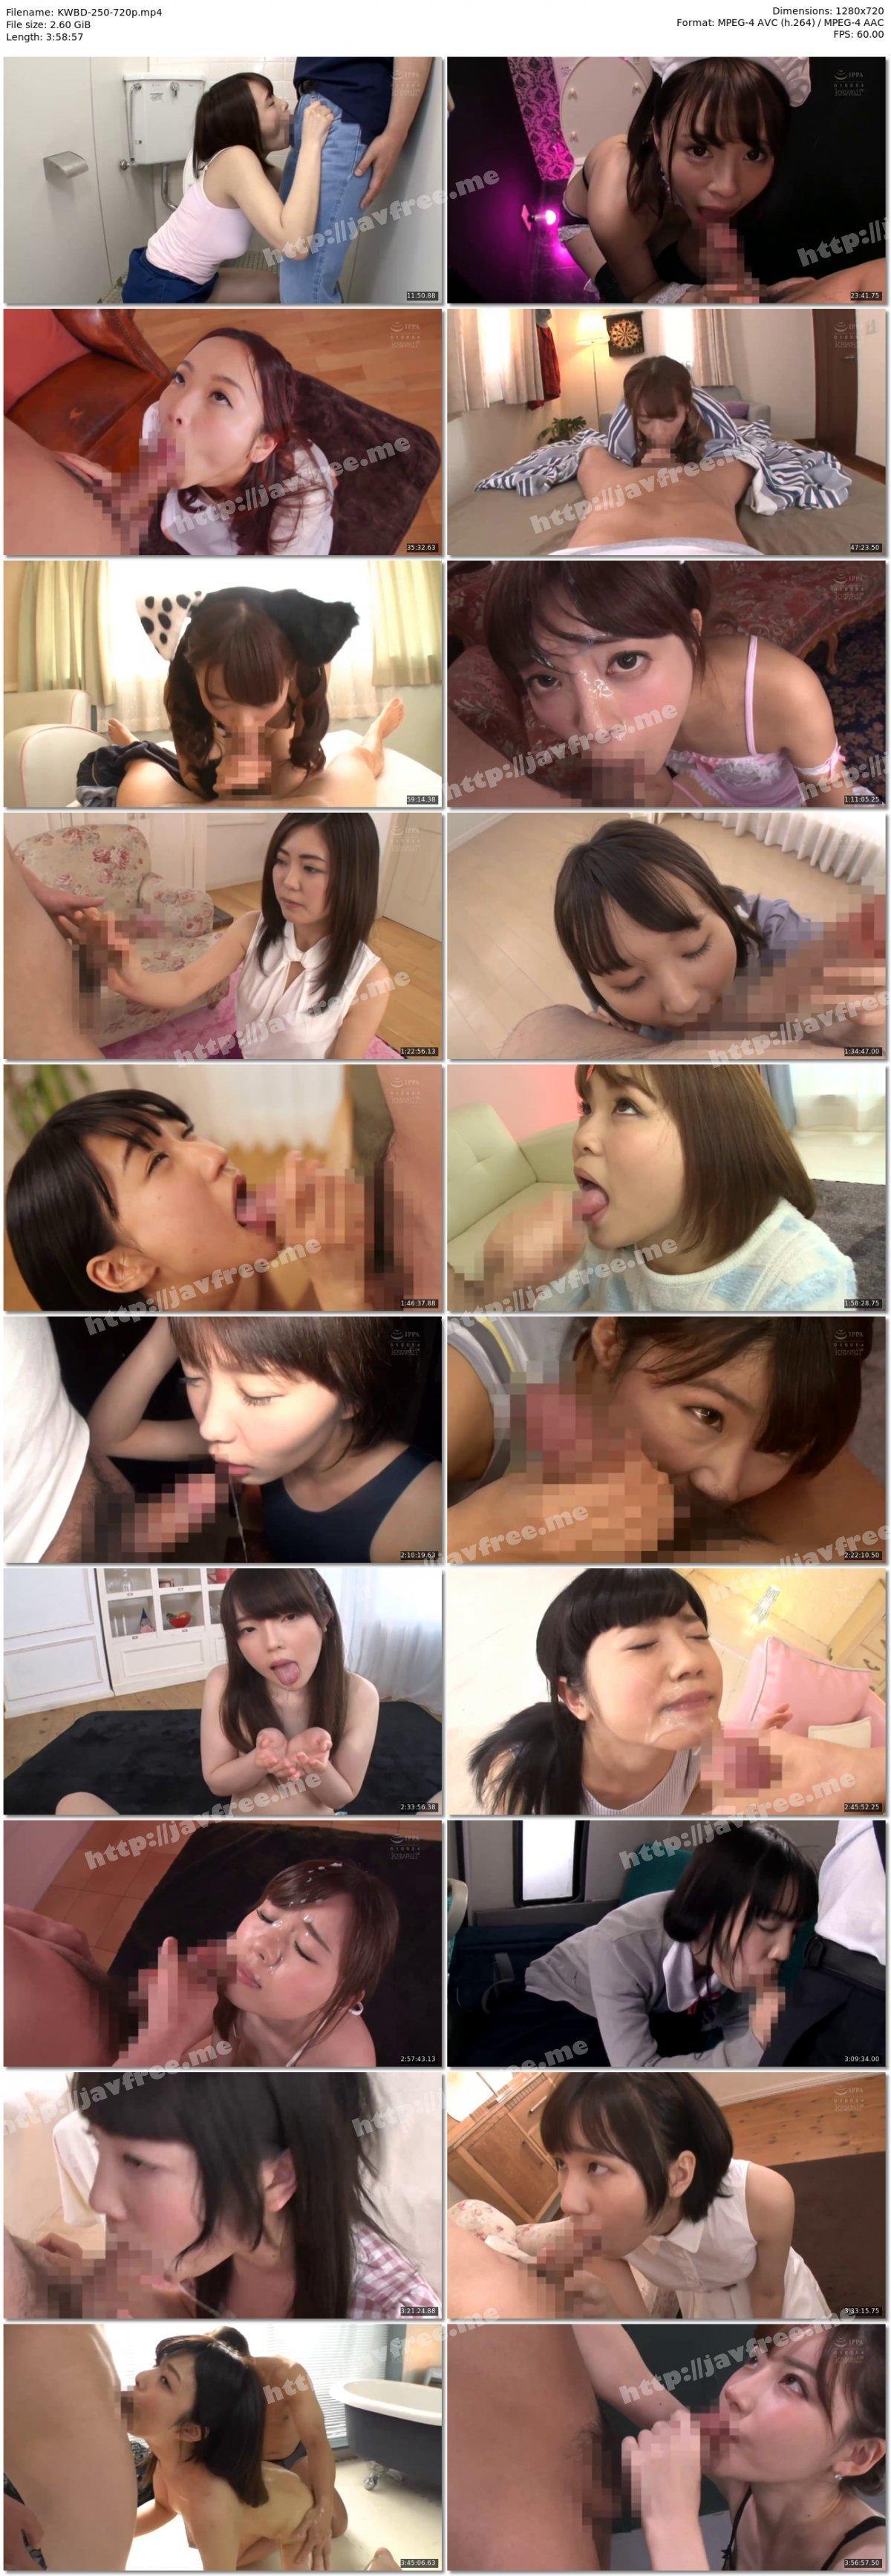 [HD][KWBD-250] kawaii*美少女35人!イク寸前の最高に気持ちいいフェラチオラッシュ60連発! - image KWBD-250-720p on https://javfree.me